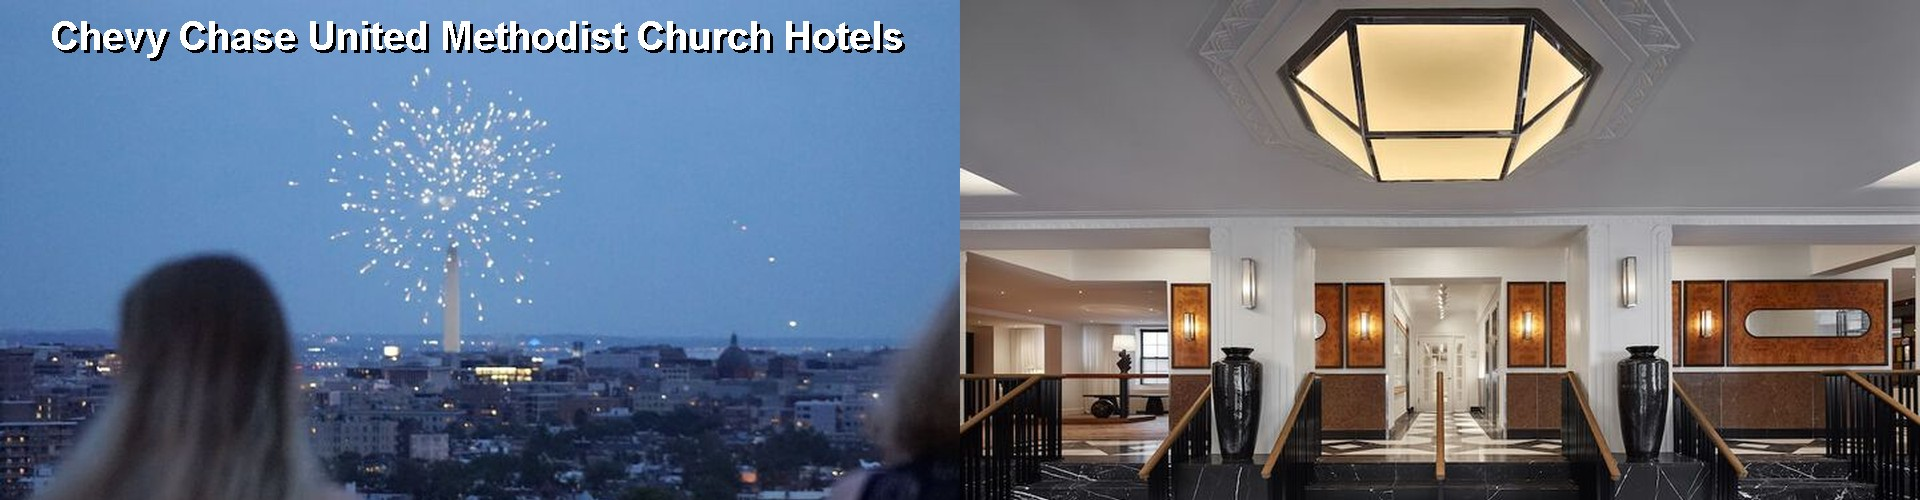 51 Hotels Near Chevy Chase United Methodist Church Md